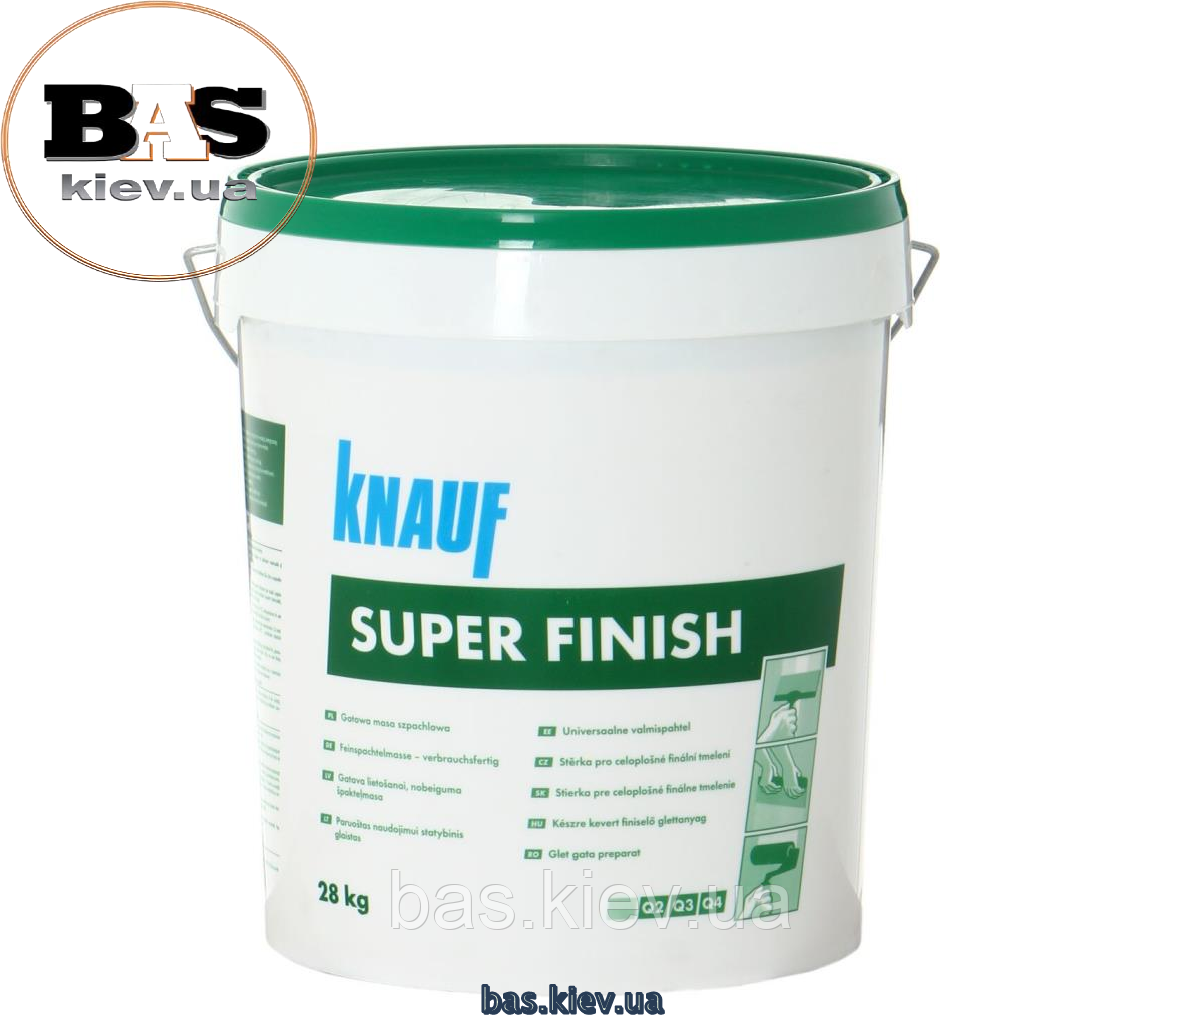 Шпаклевка Knauf Super Finish (Sheetrock), 25 kg